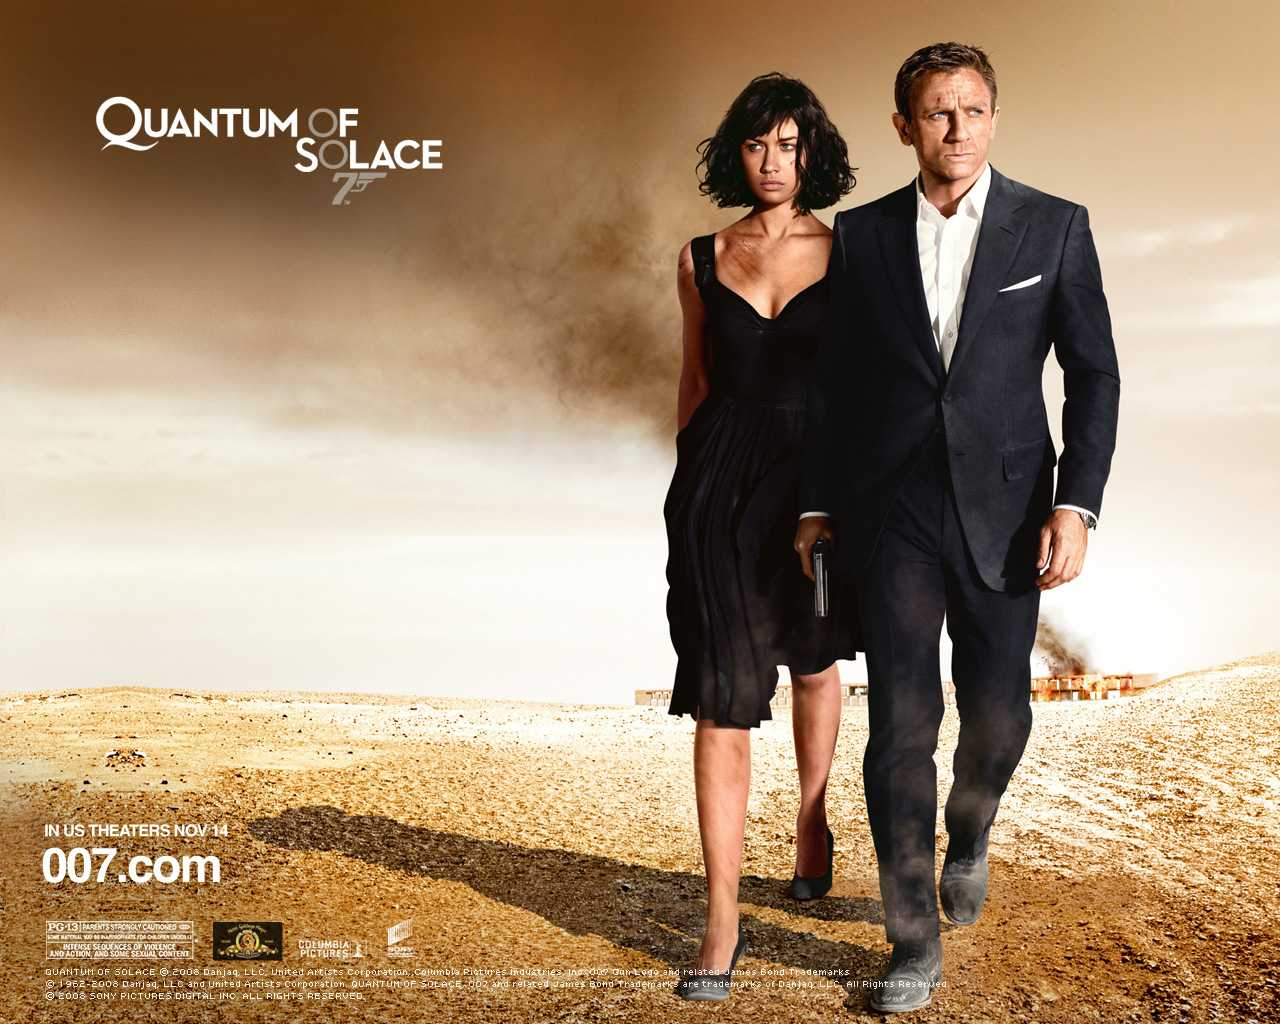 Between The Seats Definitive Bond Marathon Quantum Of